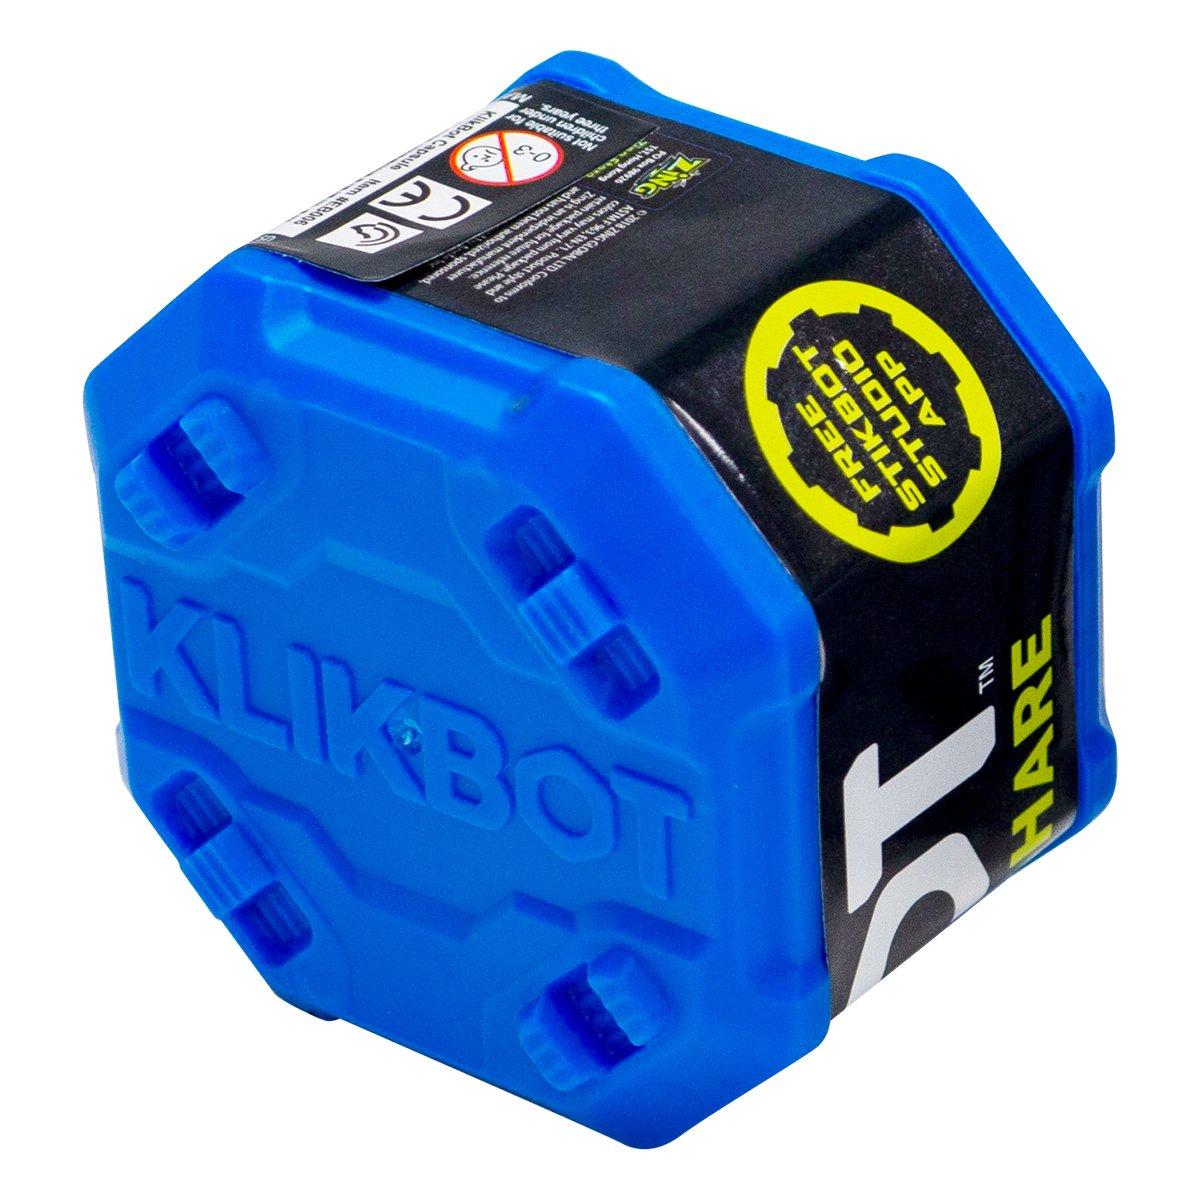 Figurina Surpriza robot articulat transformabil in capsula Klikbot, Blue